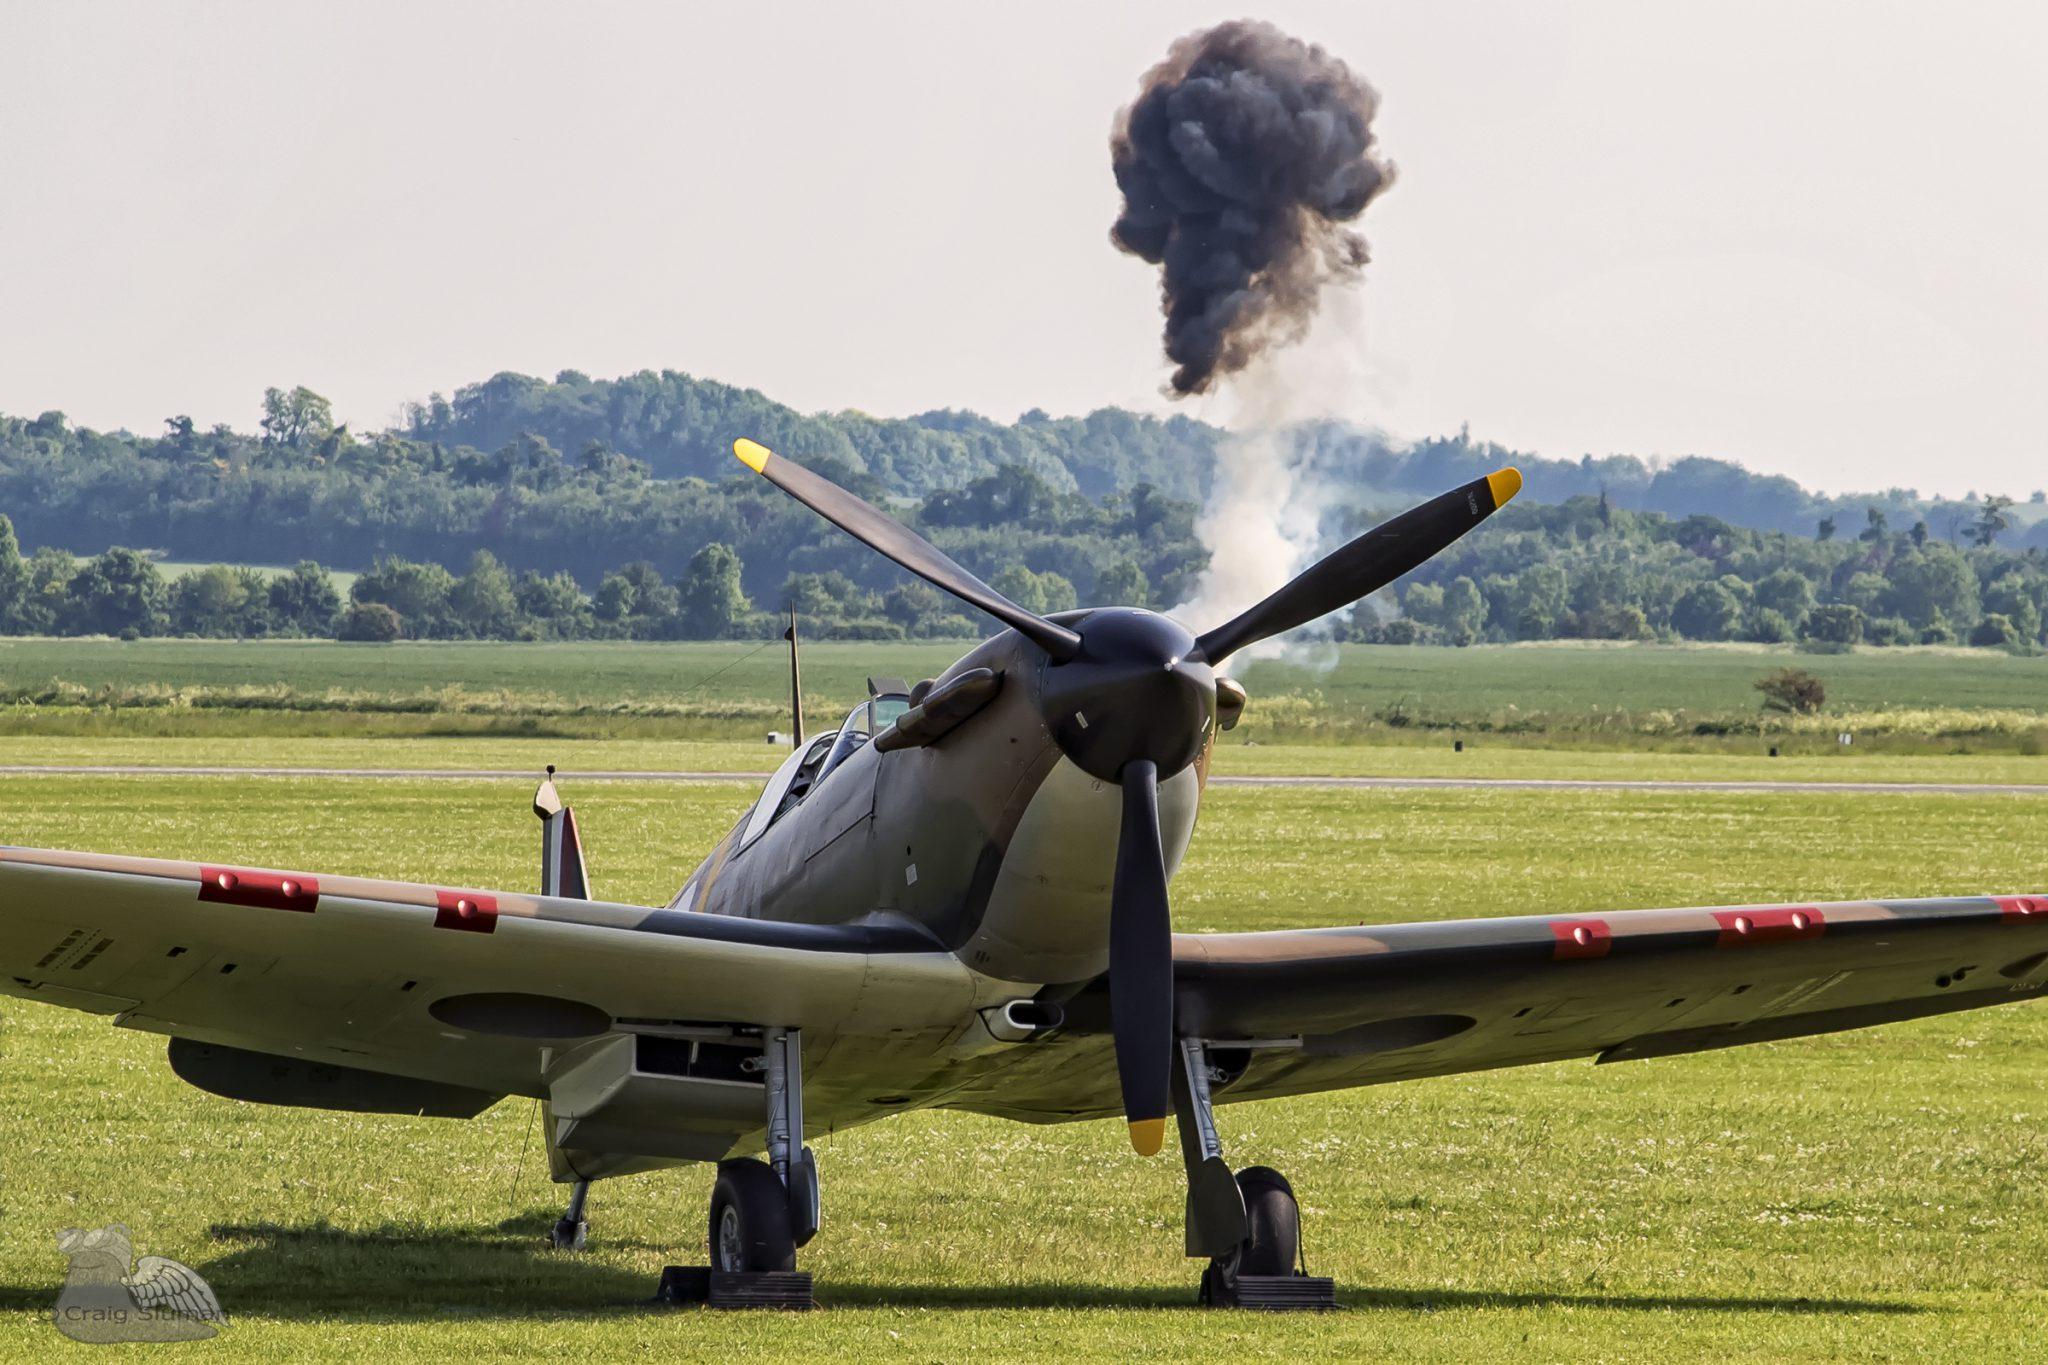 spitfire merlin engine asali designs